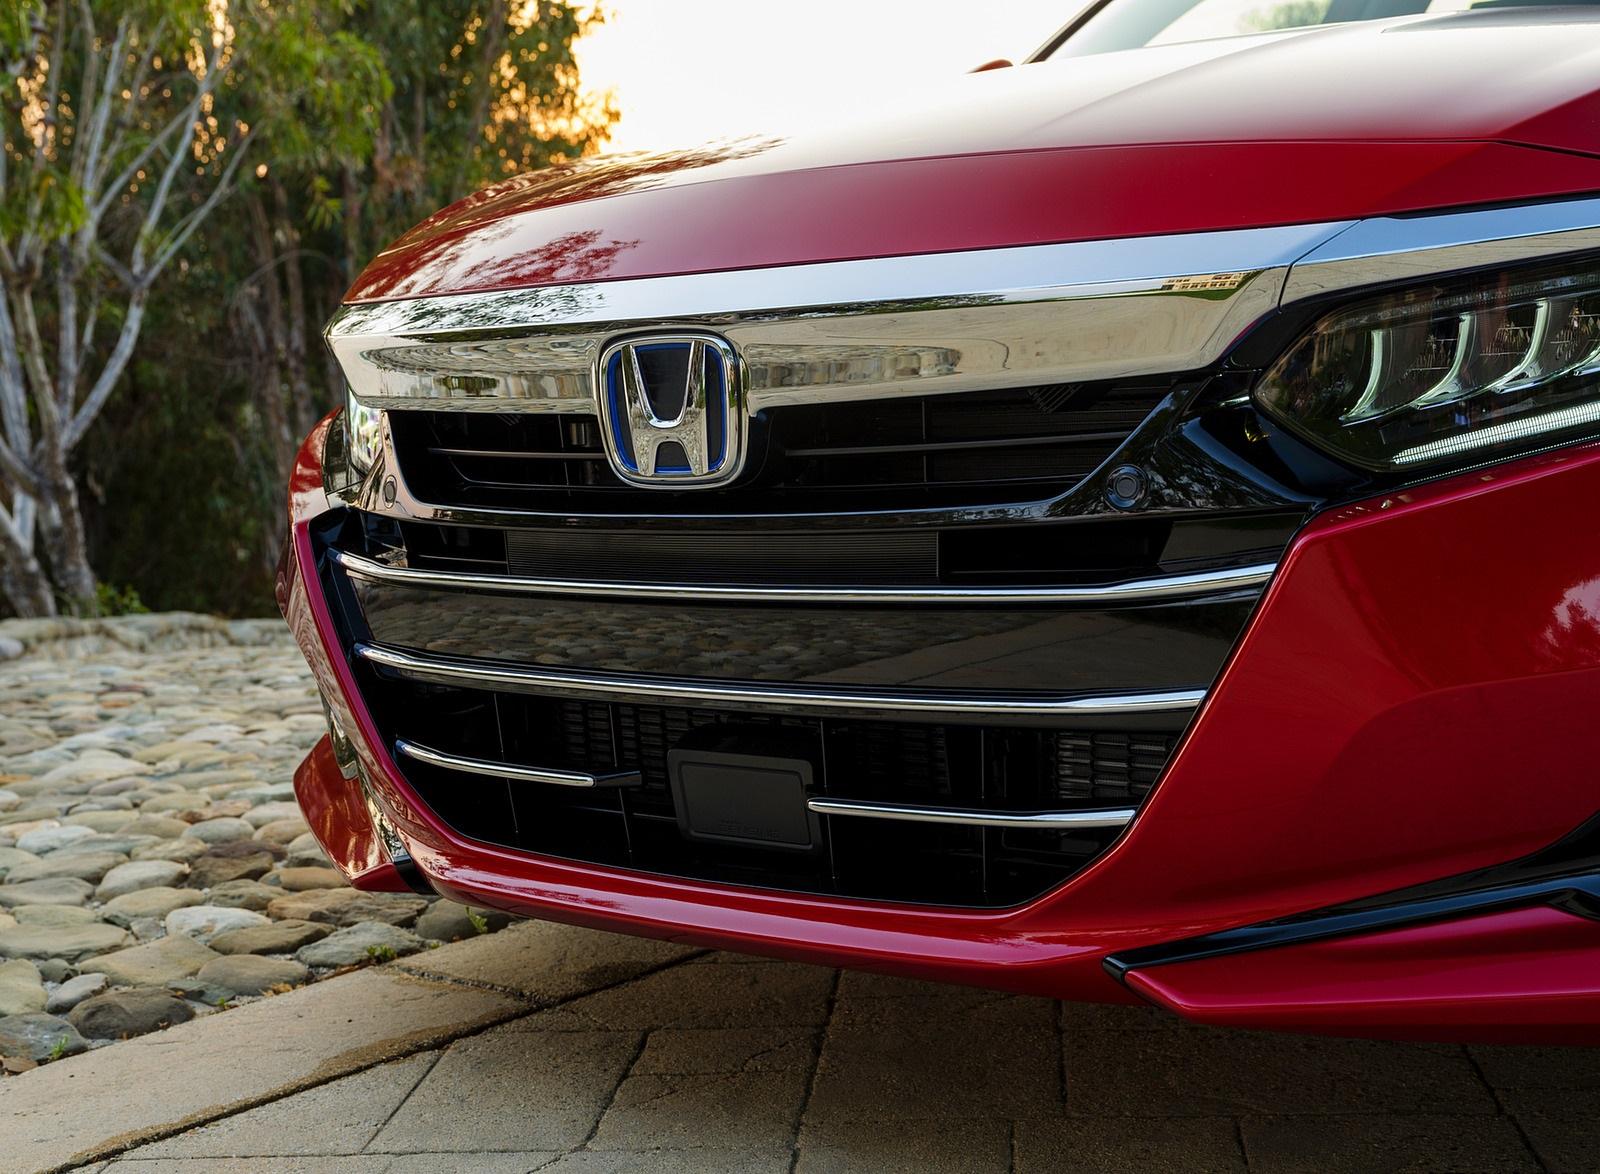 2021 Honda Accord Hybrid Grill Wallpapers (9)